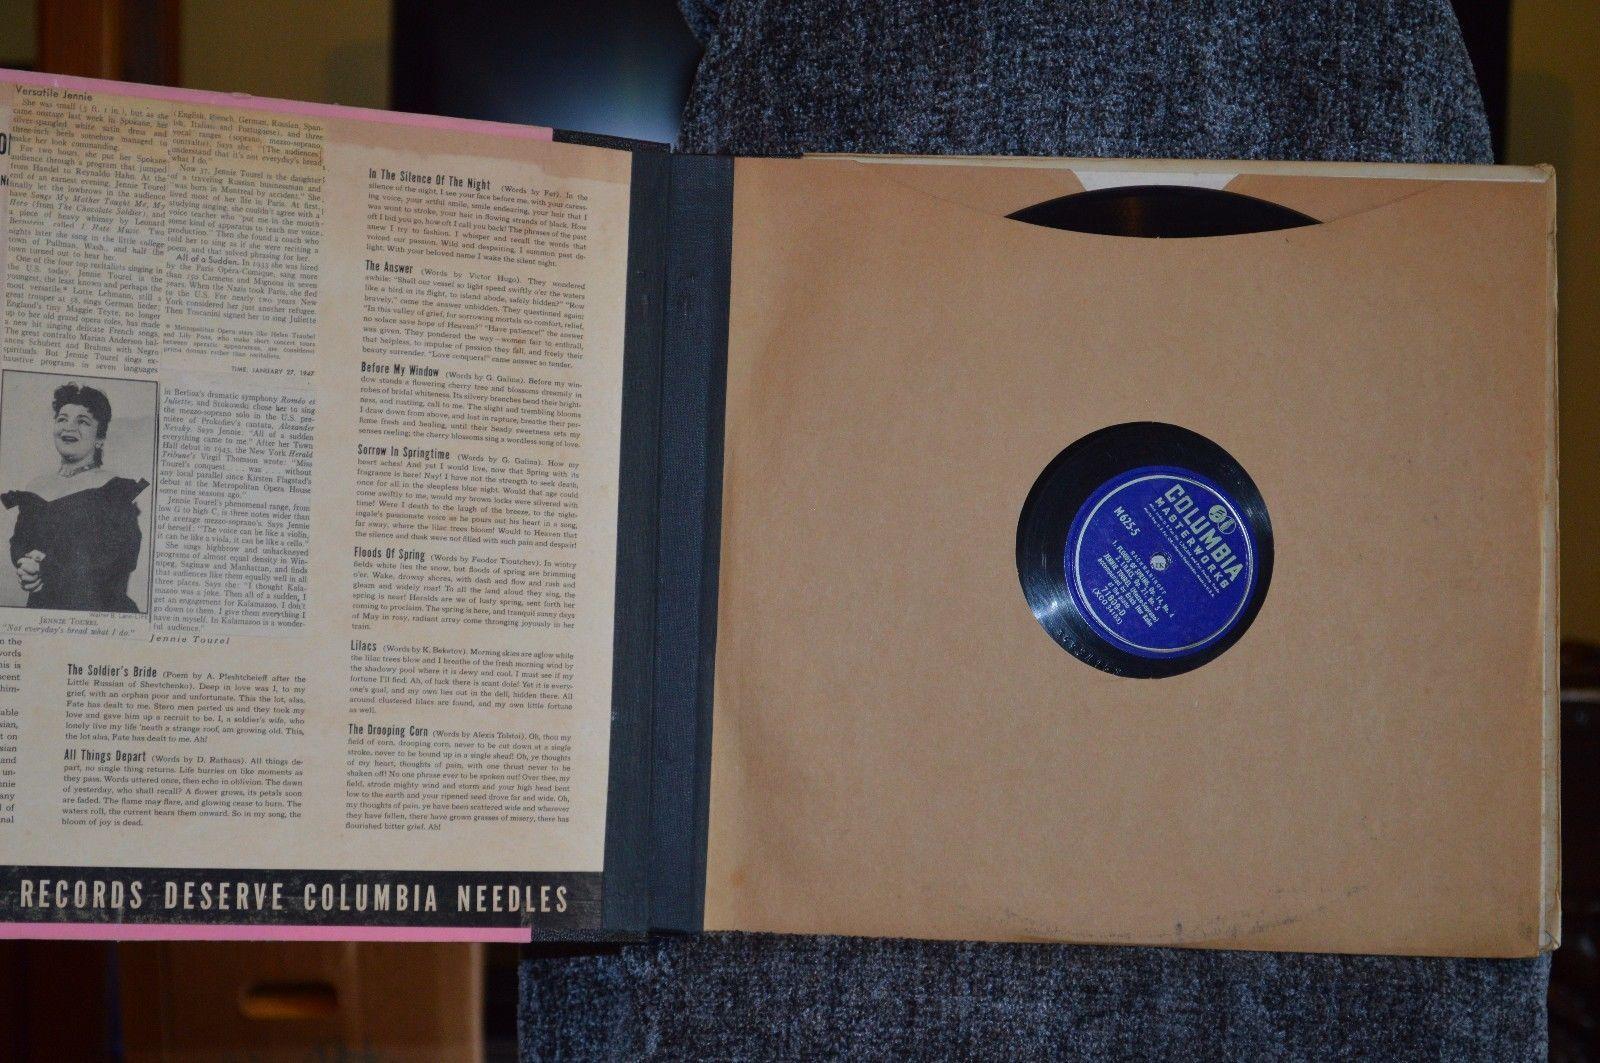 Jennie Tourel, Songs of rachmaninoff, Vinyl set